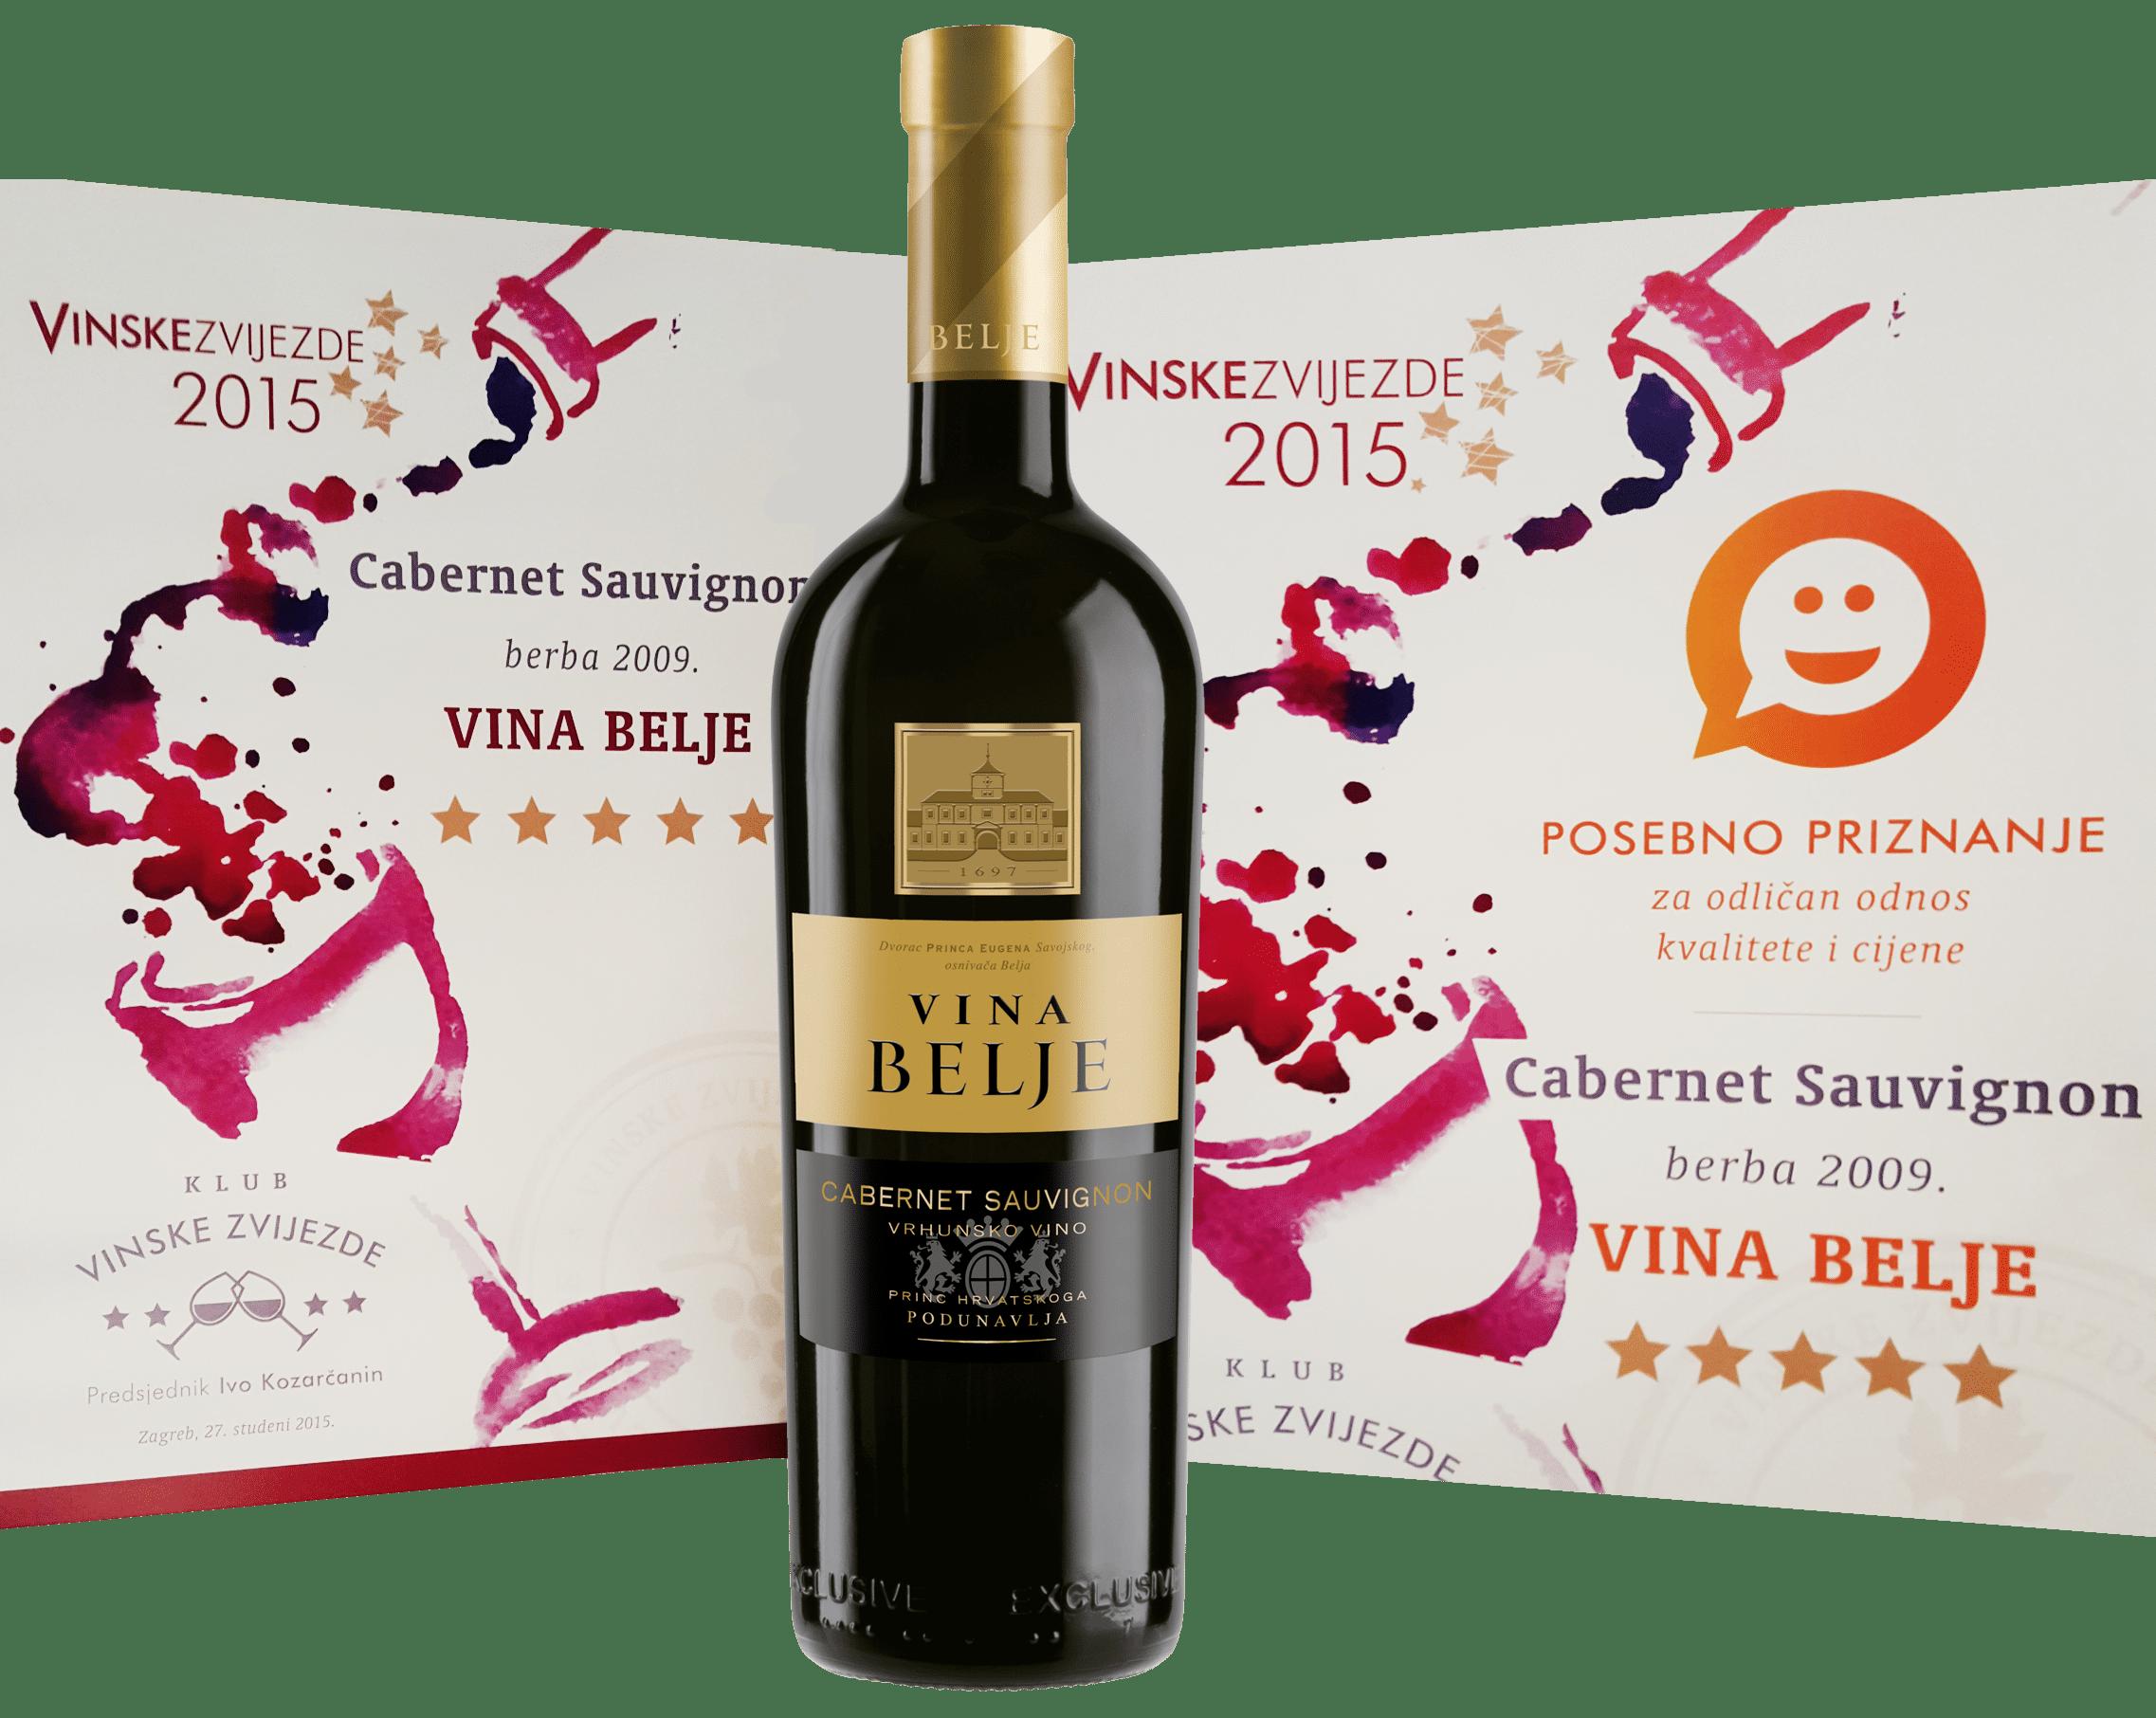 Cabernet Sauvignon - Vinske zvijezde 2015